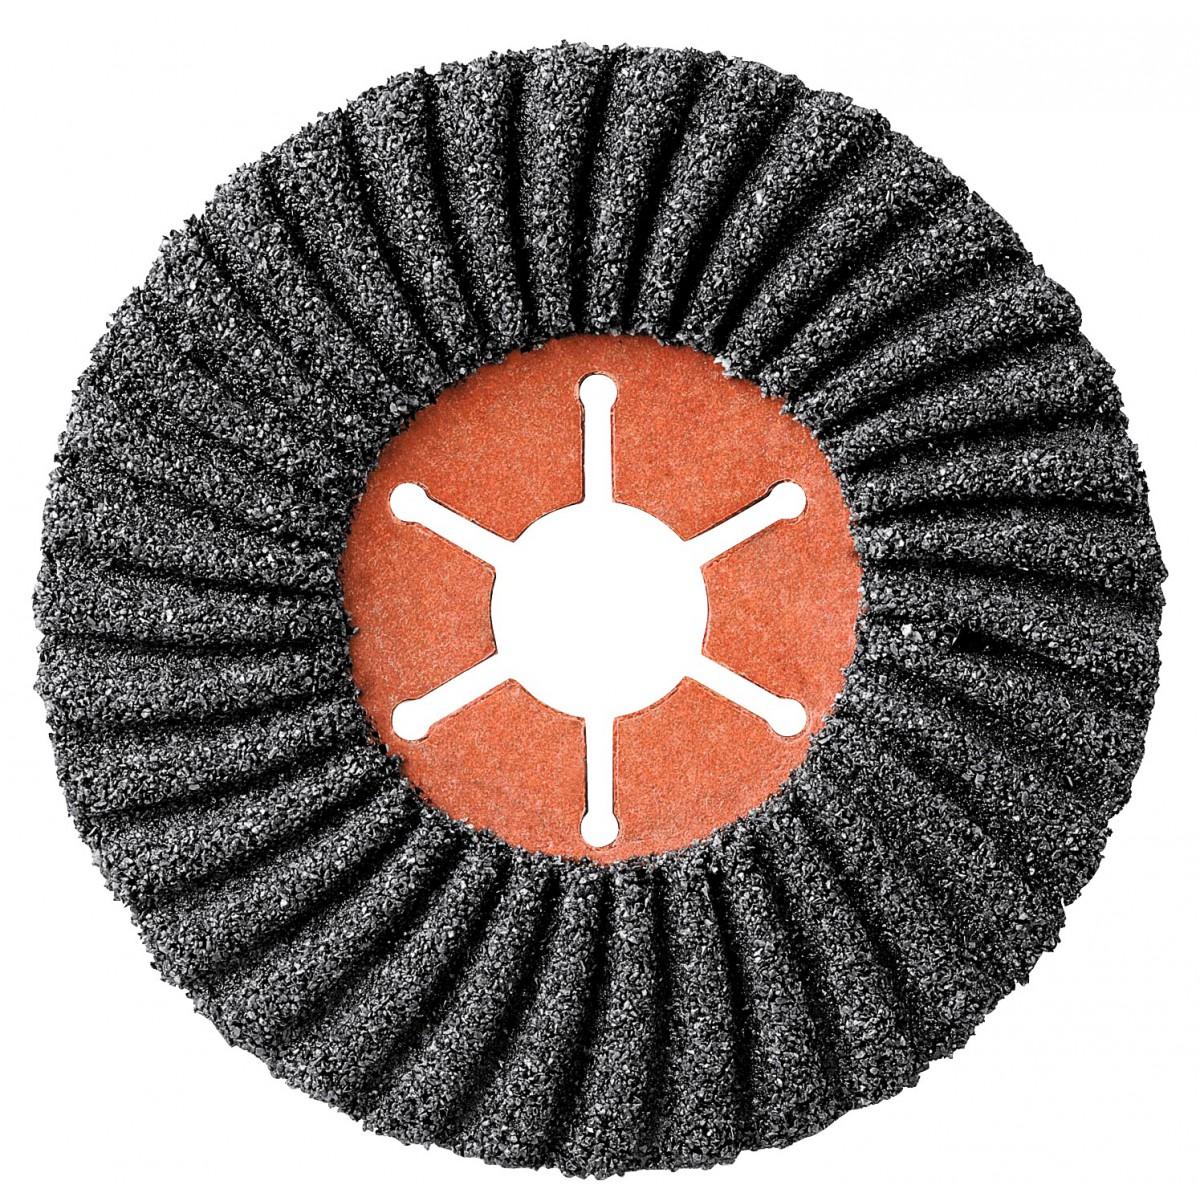 Disque semiflexible carbure de silicium diamètre 115 x 22 mm SCID - Grain 24